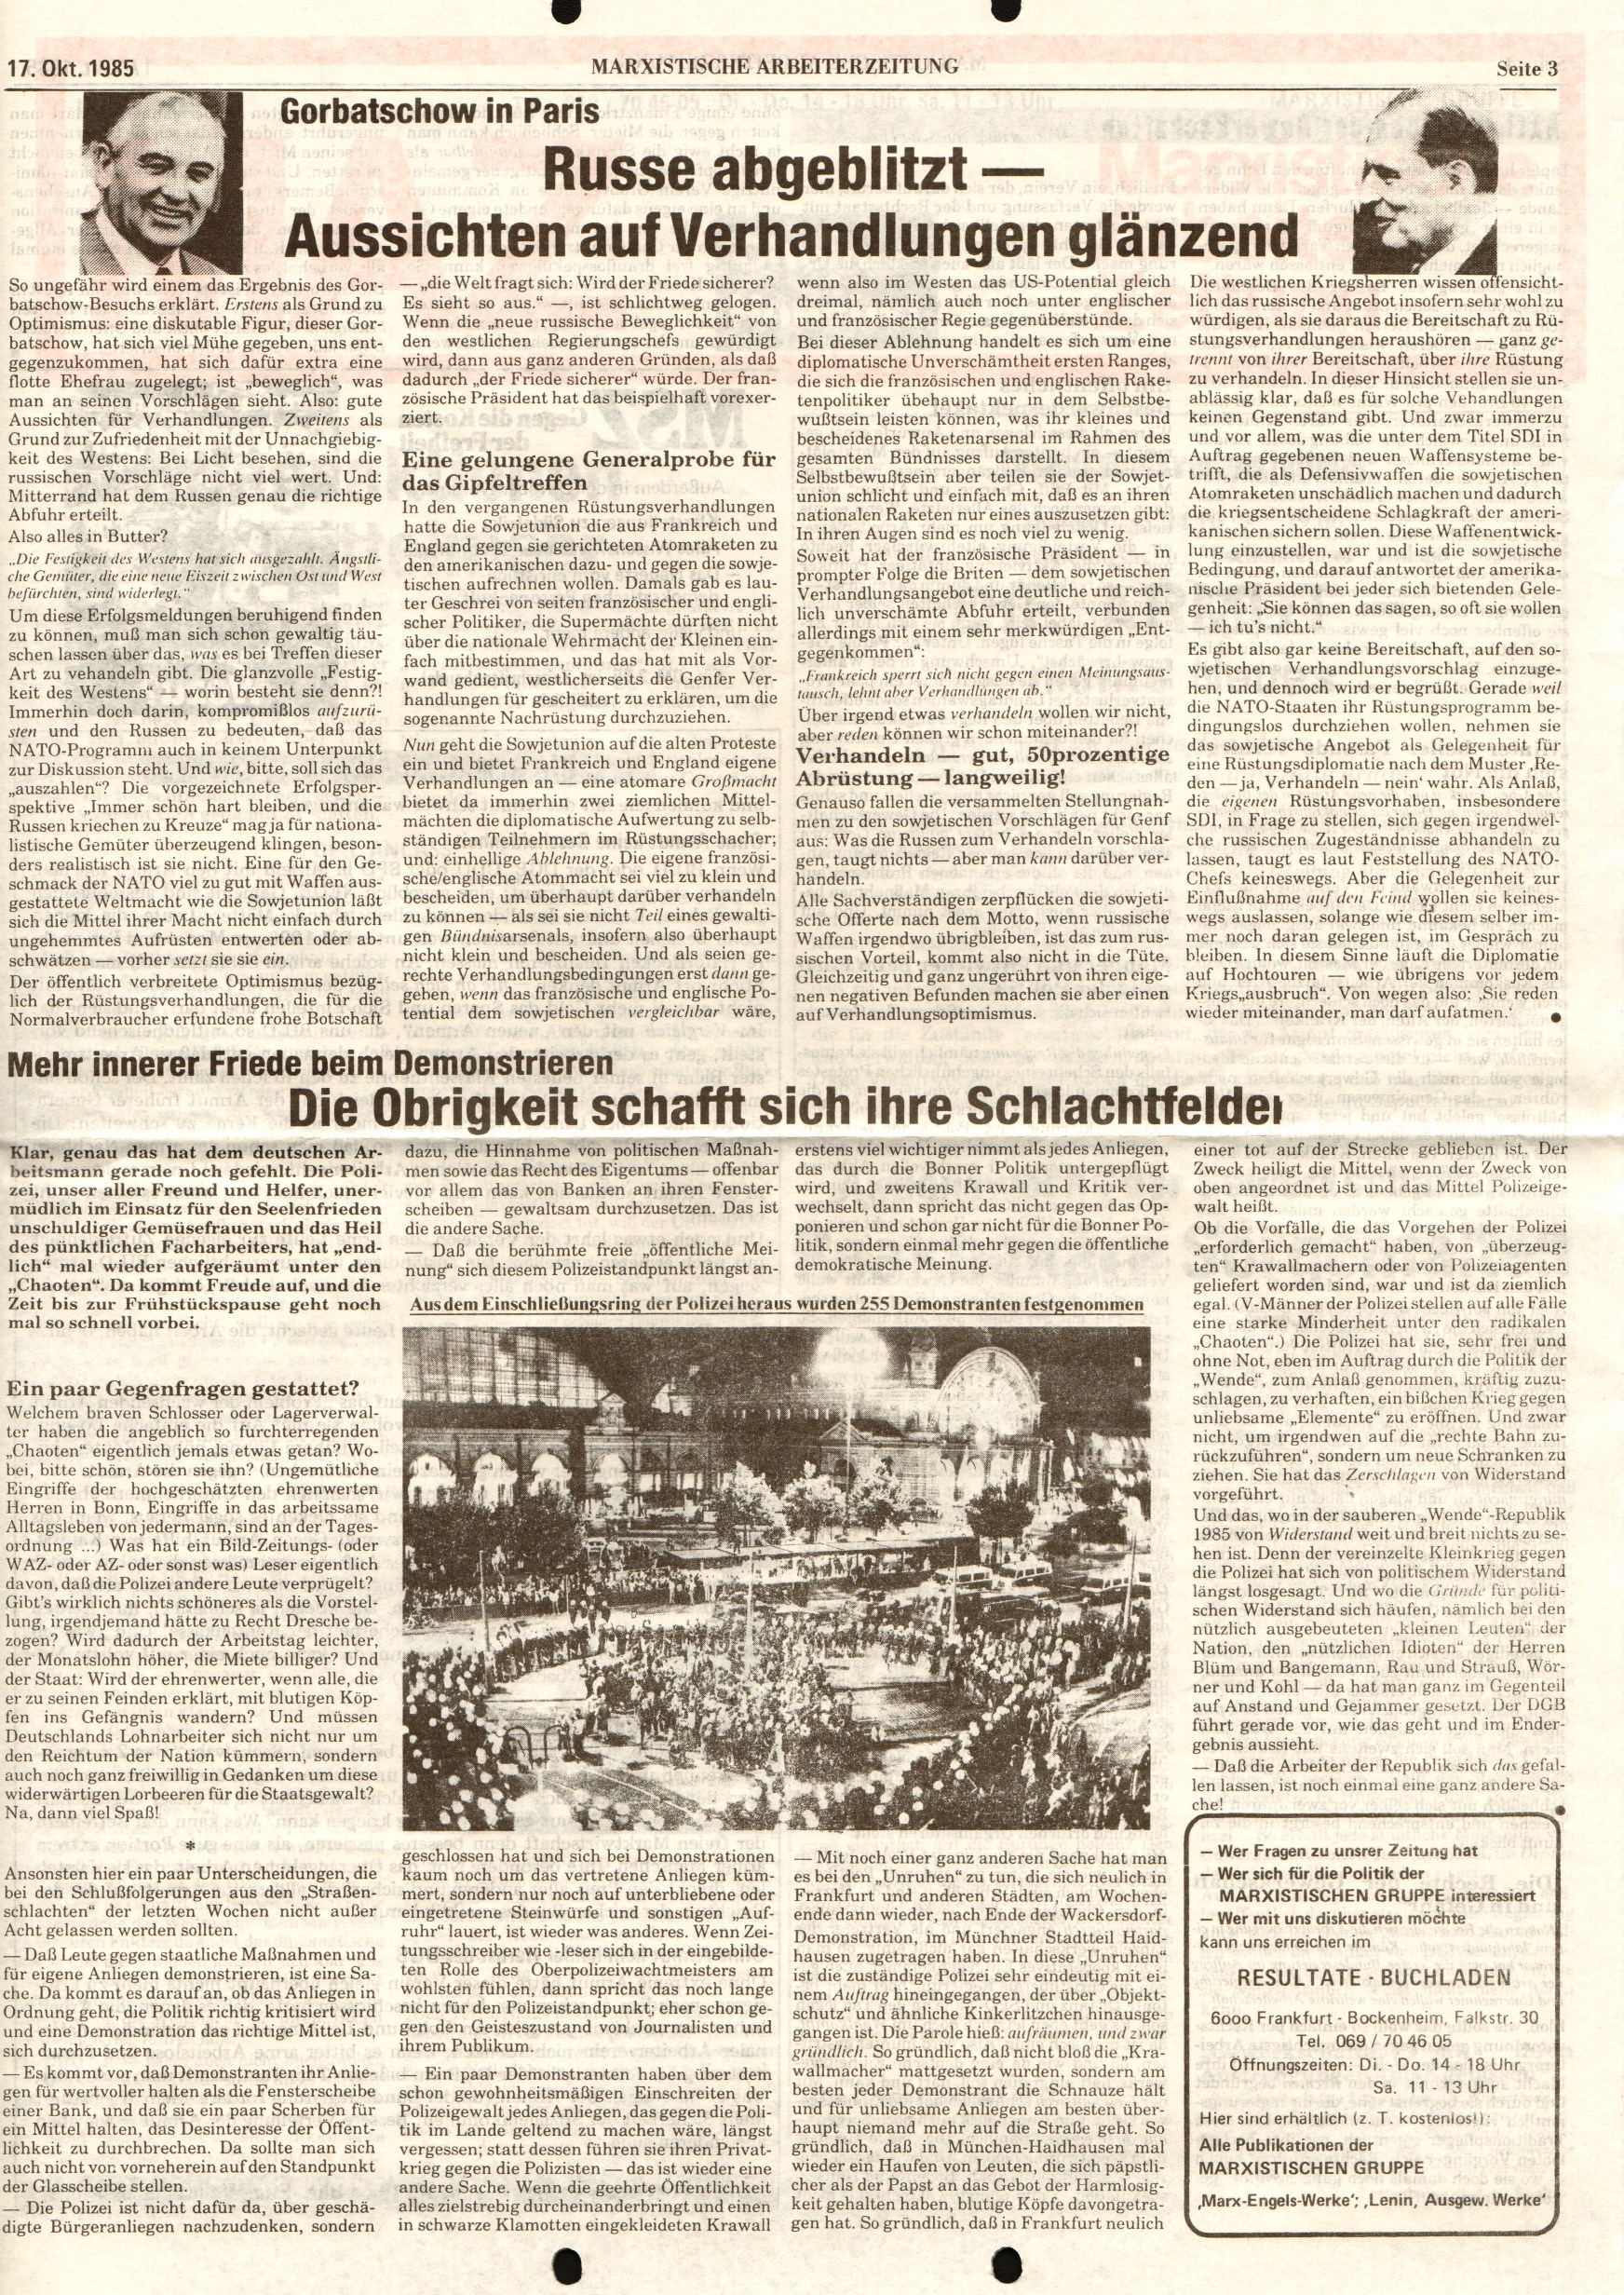 Frankfurt_CPK_Hoechst_MAZ337